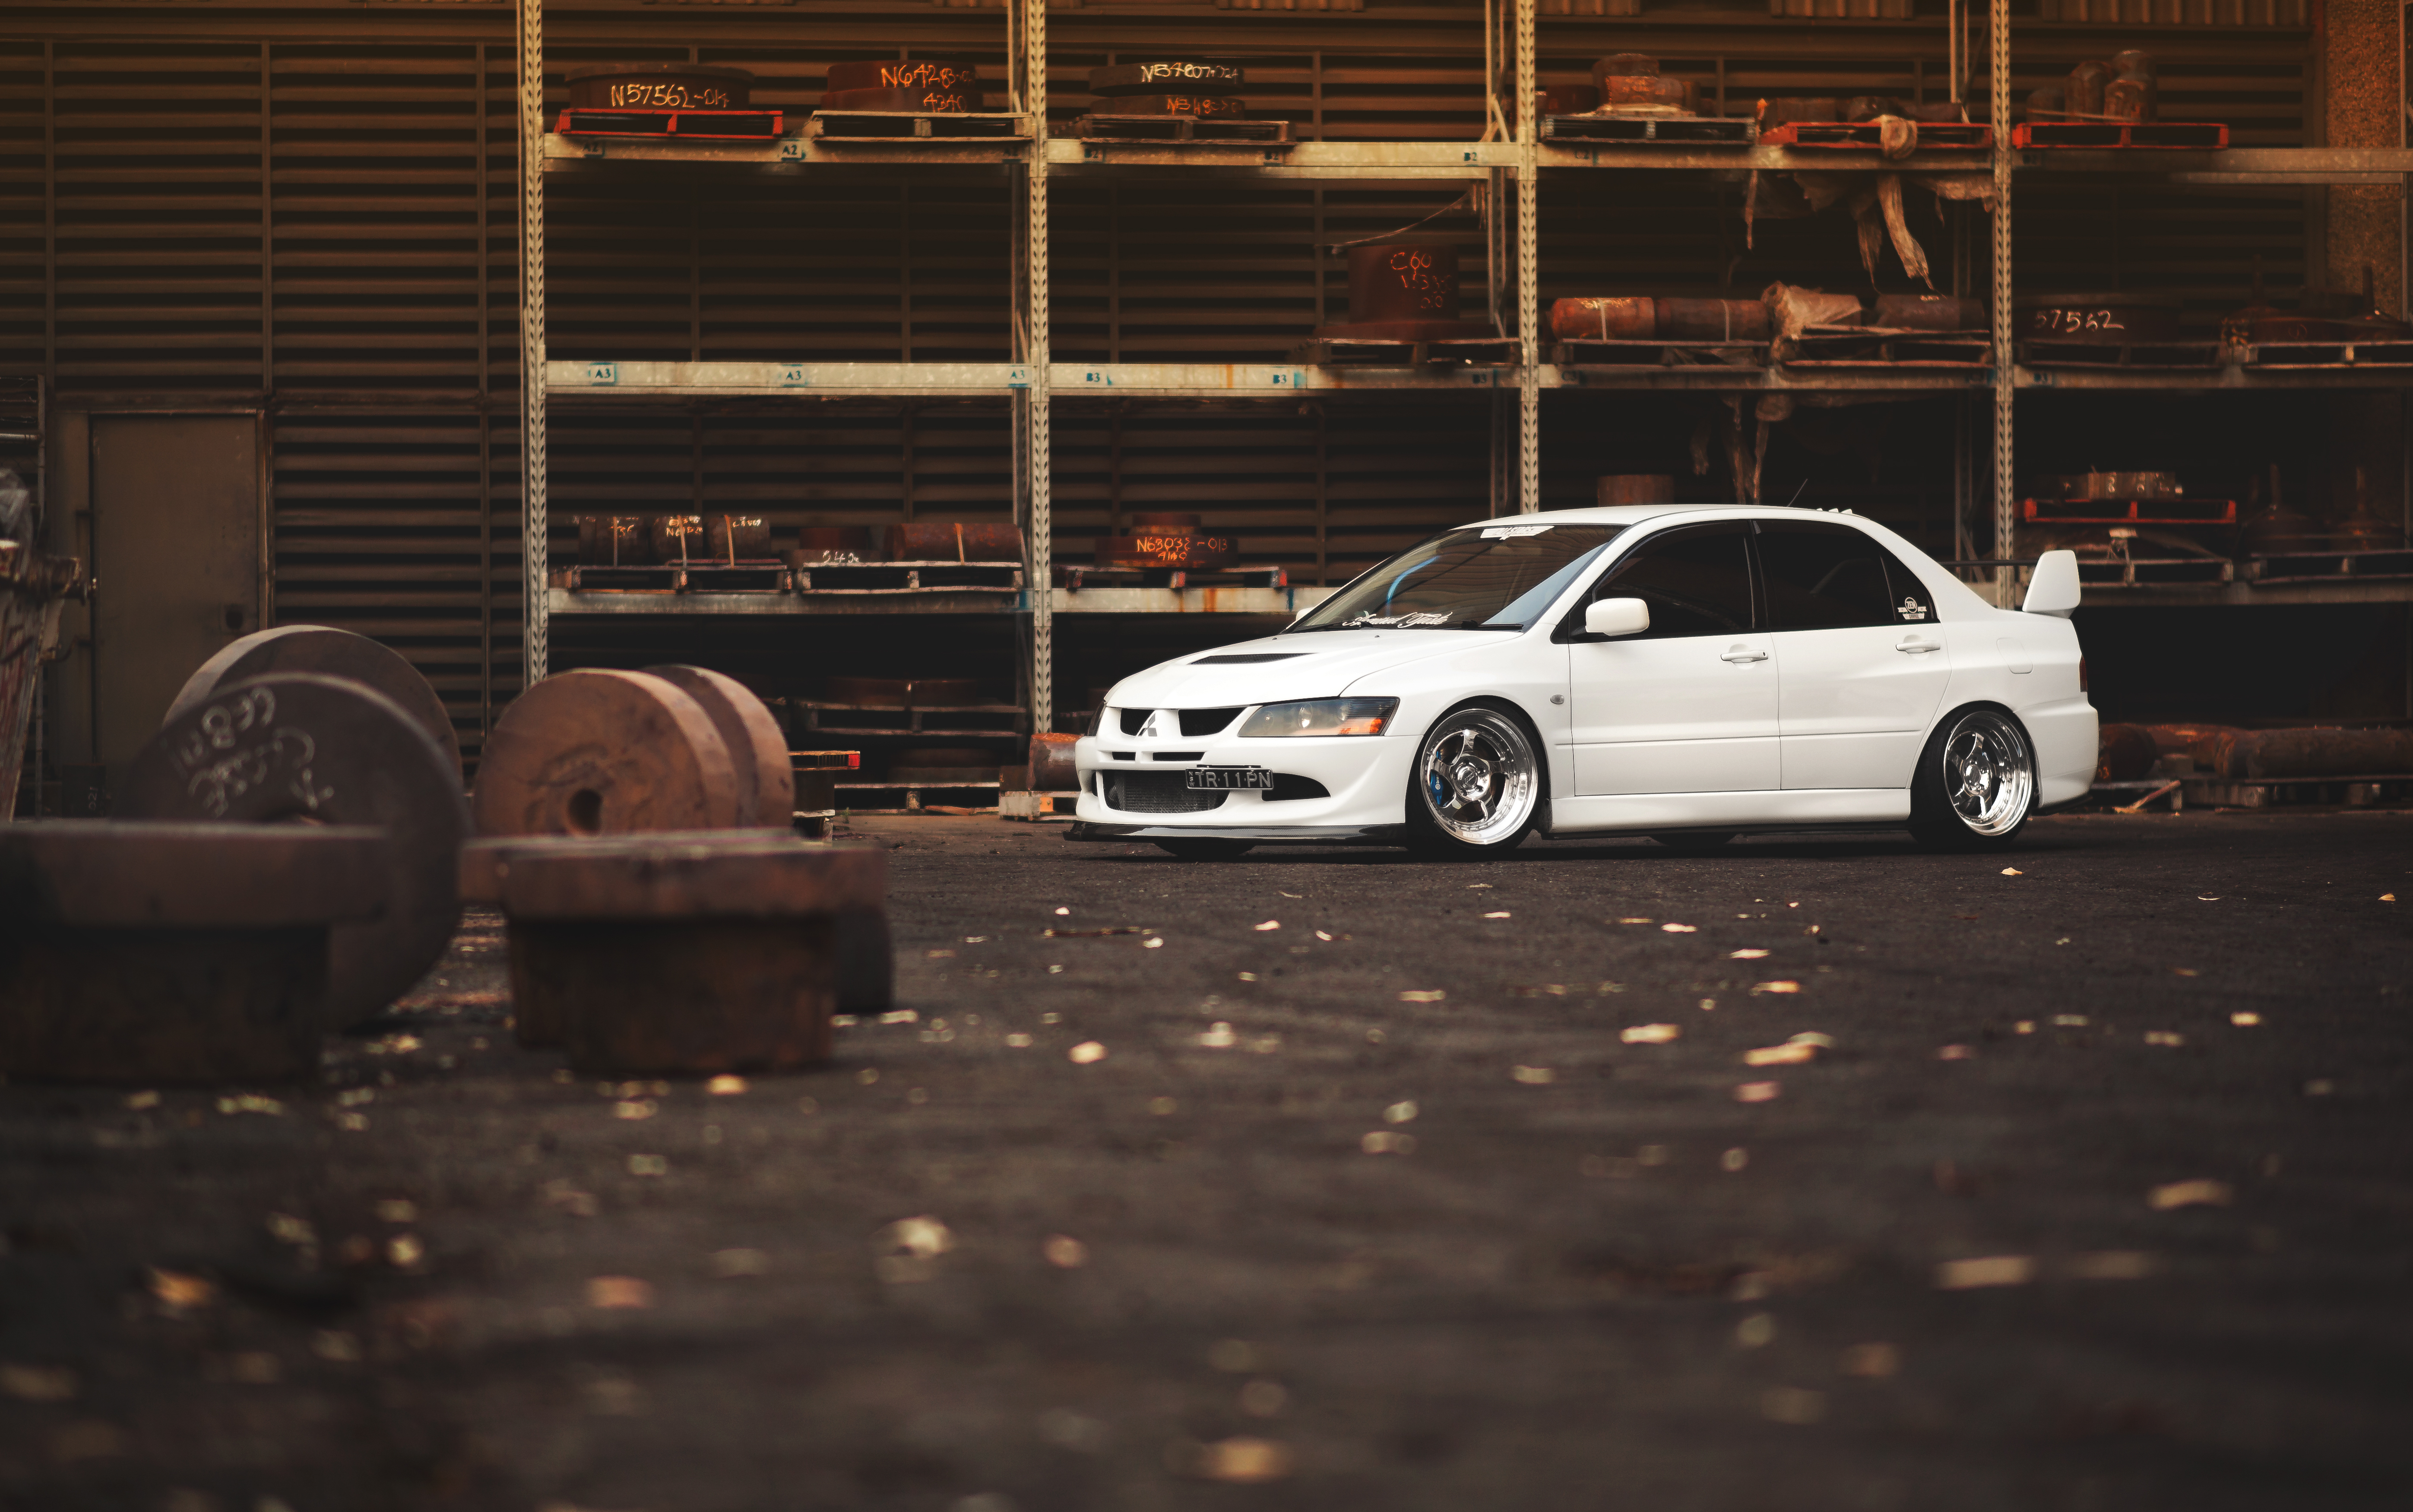 Mitsubishi Evolution VIII 5k Retina Ultra HD Wallpaper and Background Image  5588x3502  ID:484027